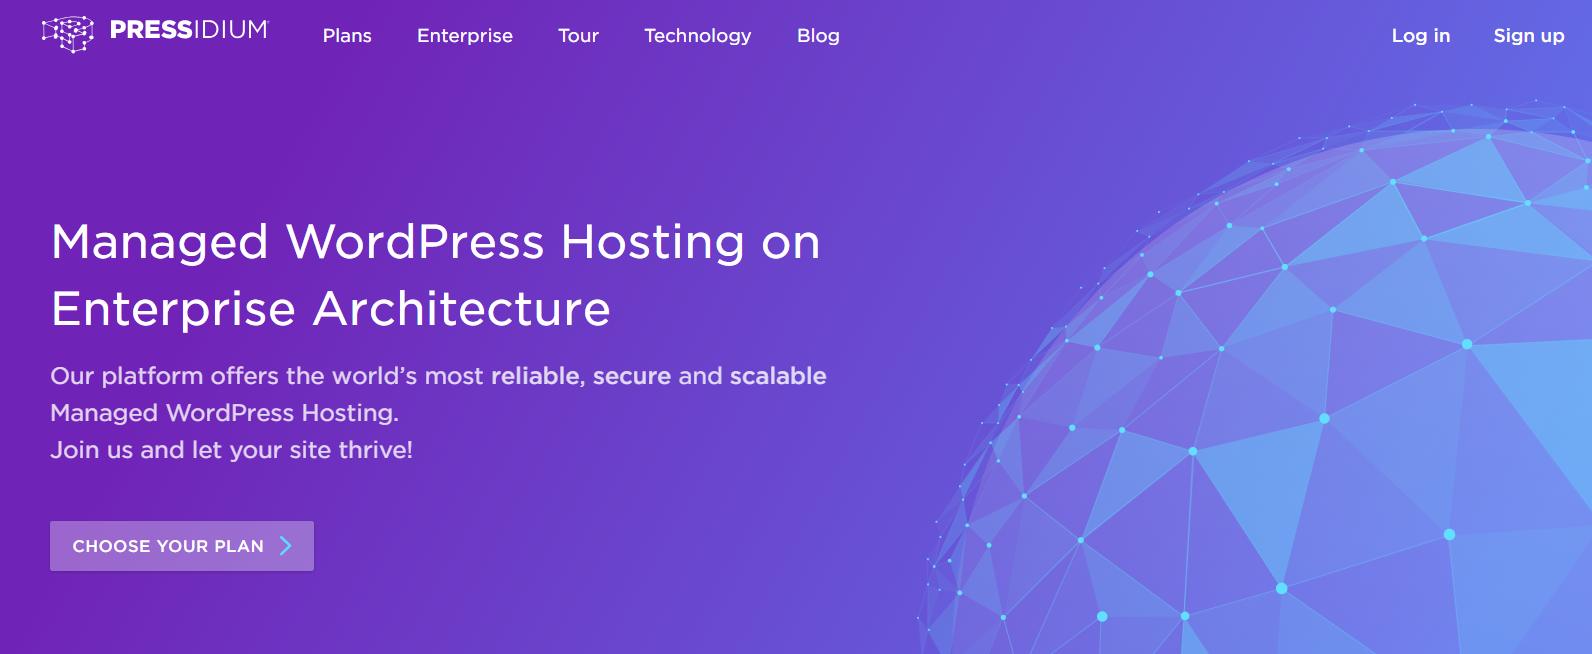 Pressidium® Review- Managed WordPress Hosting